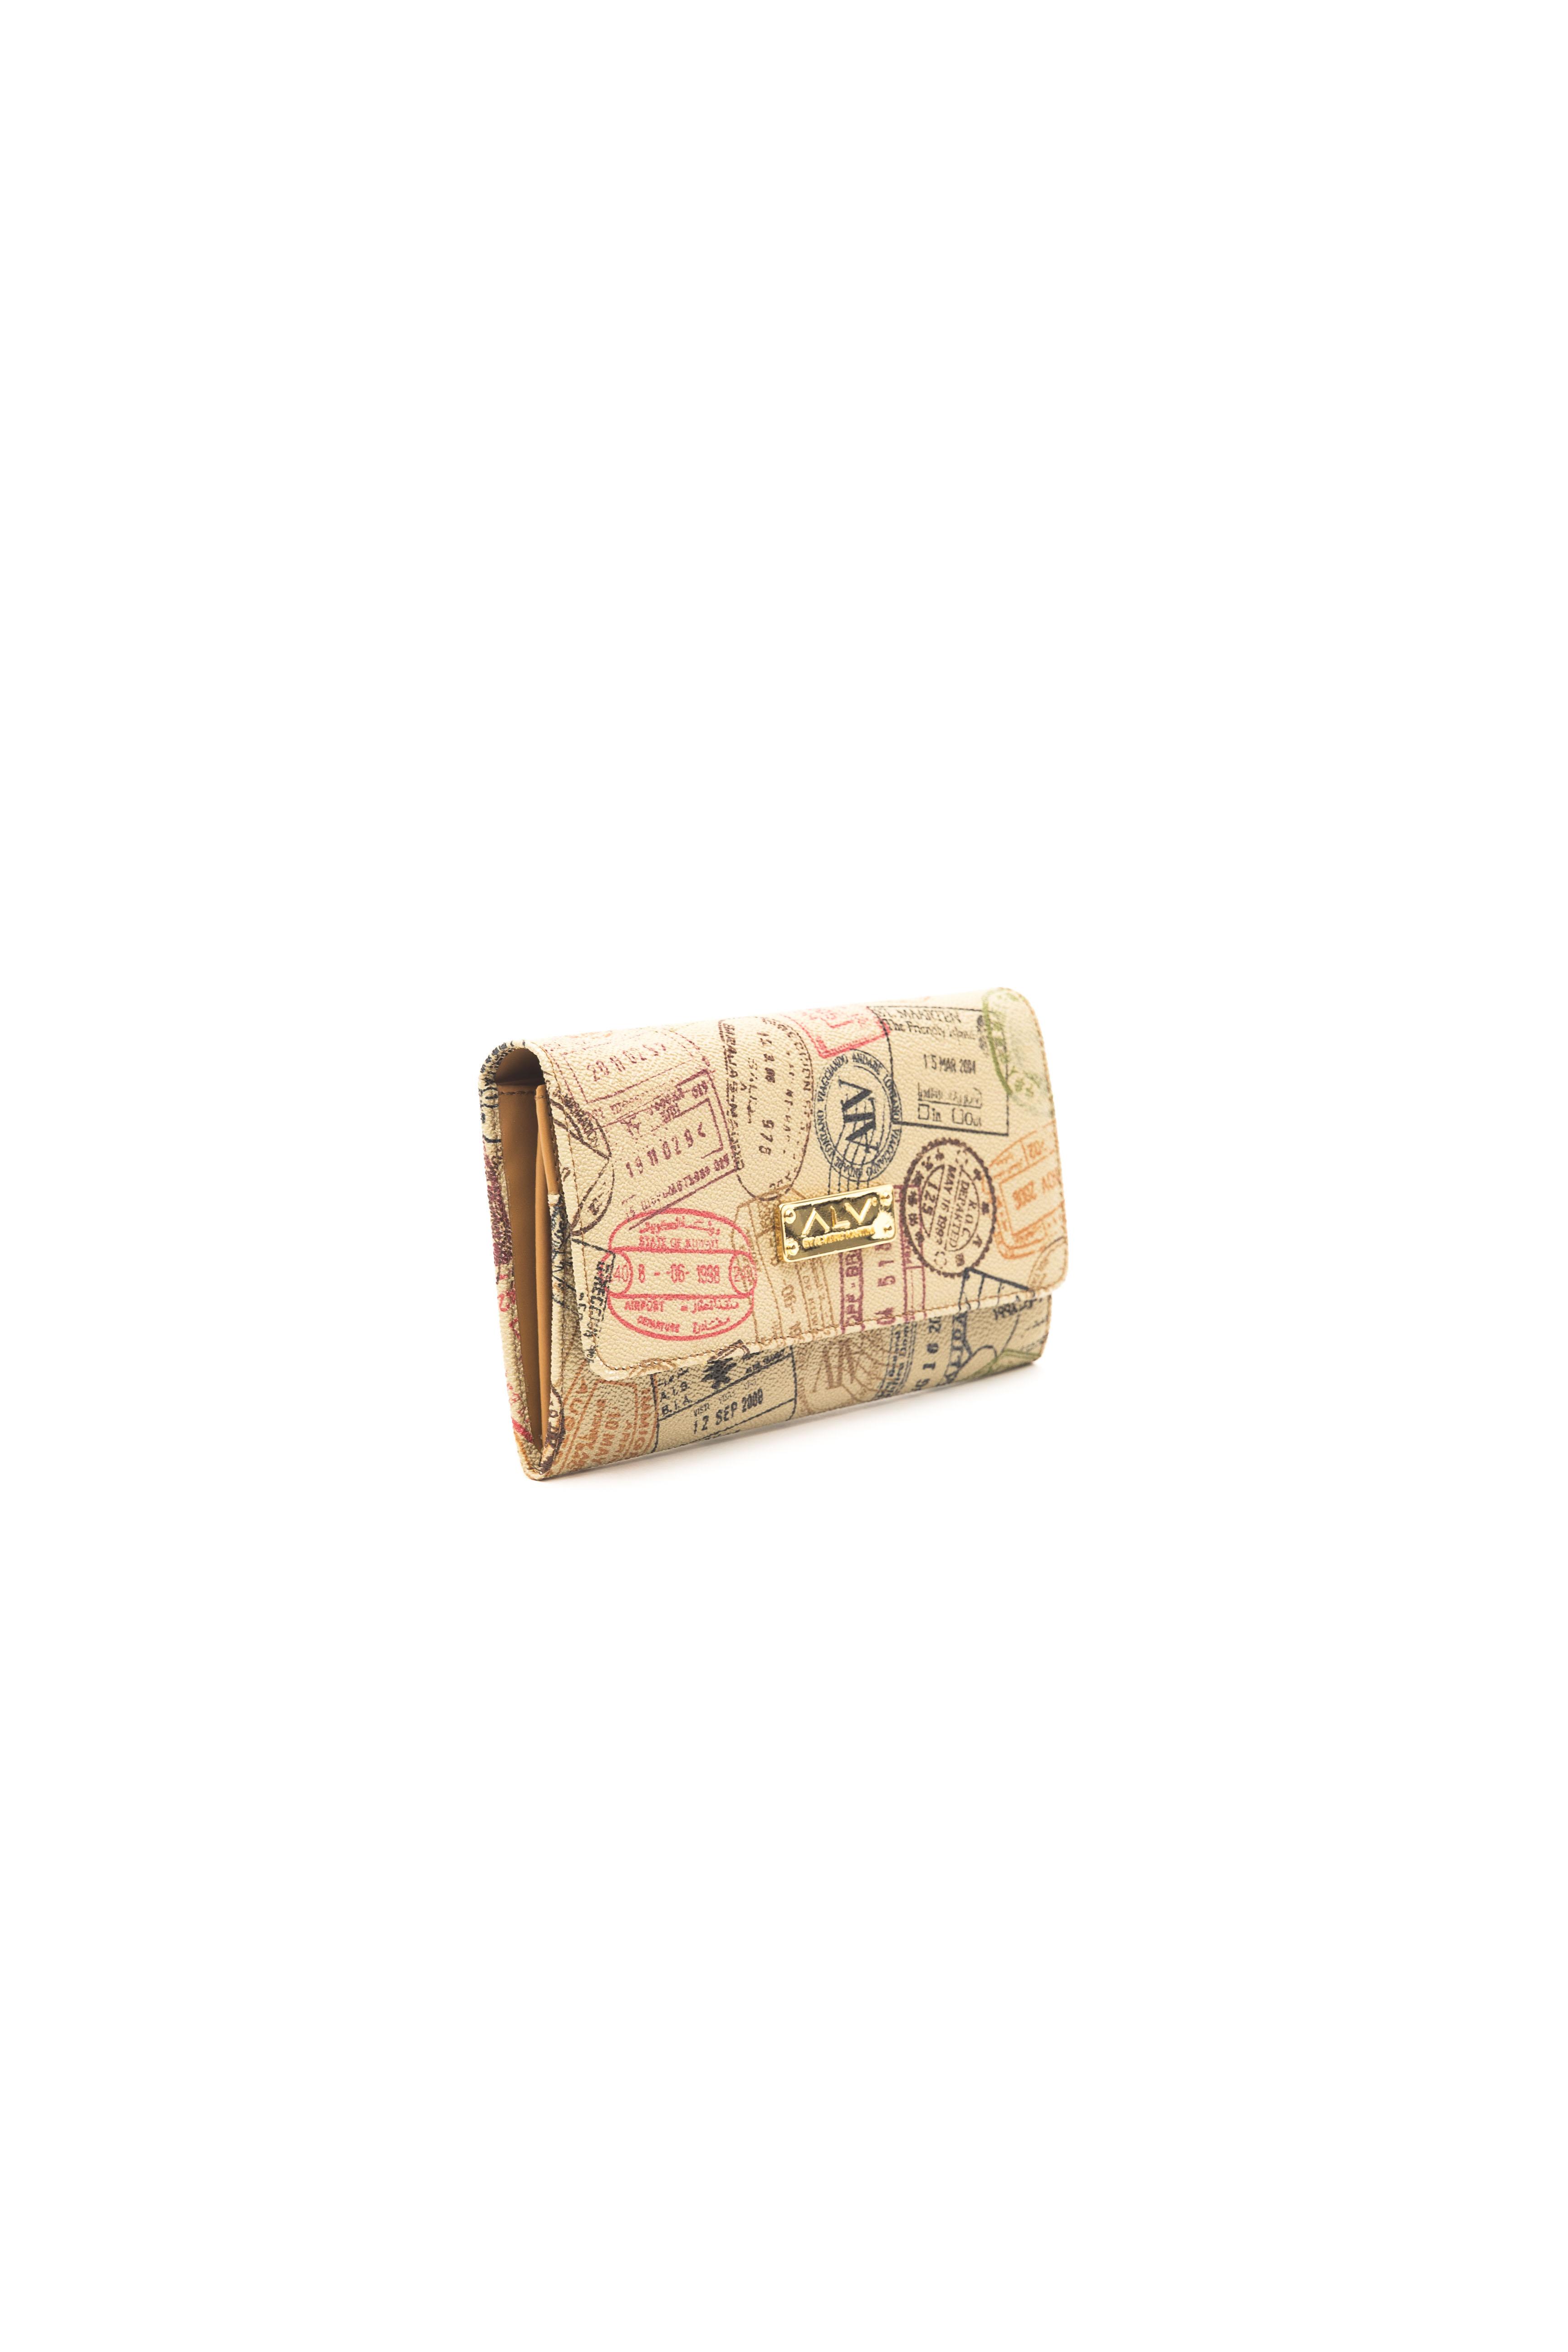 Martini Femme Wallet Beige Alviero Ever117d002p wPk0OXZN8n